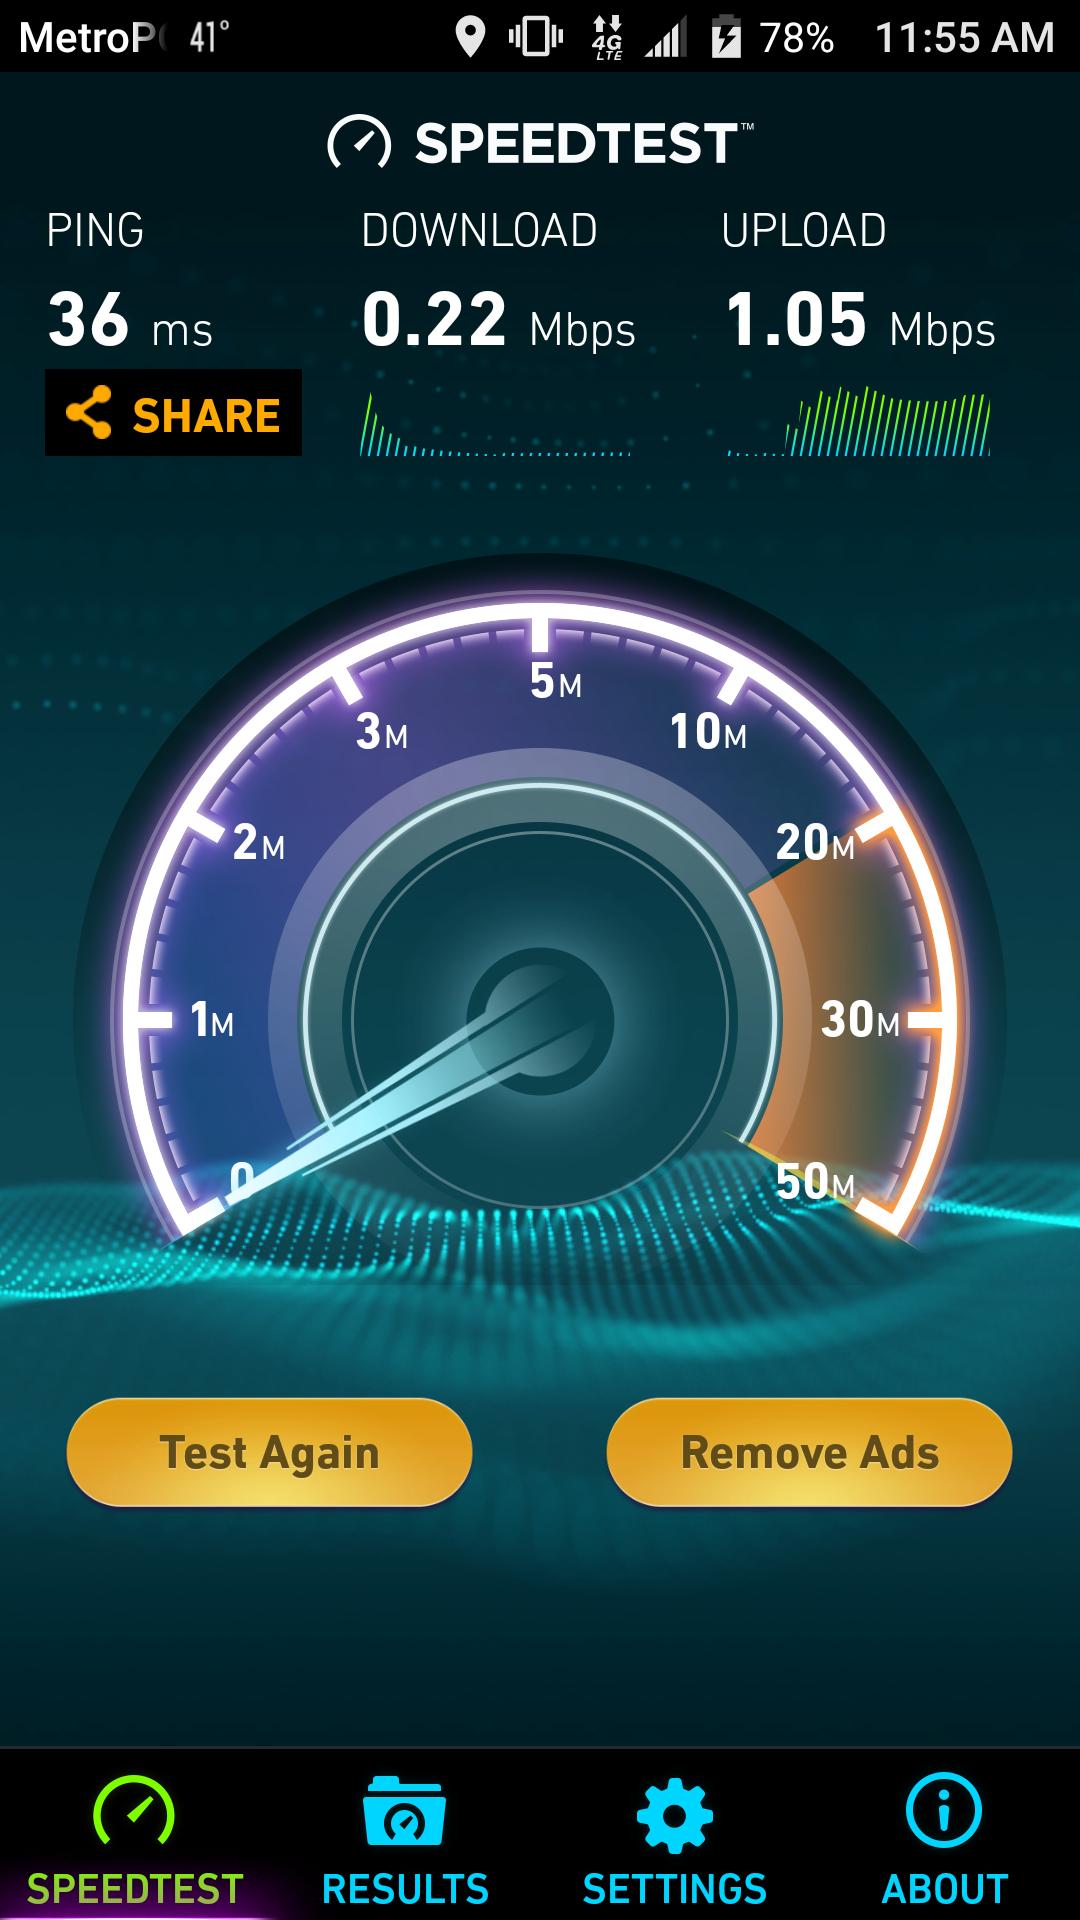 Slow 4G LTE speeds with ZMAX Pro on Metro PCS — Z-Community